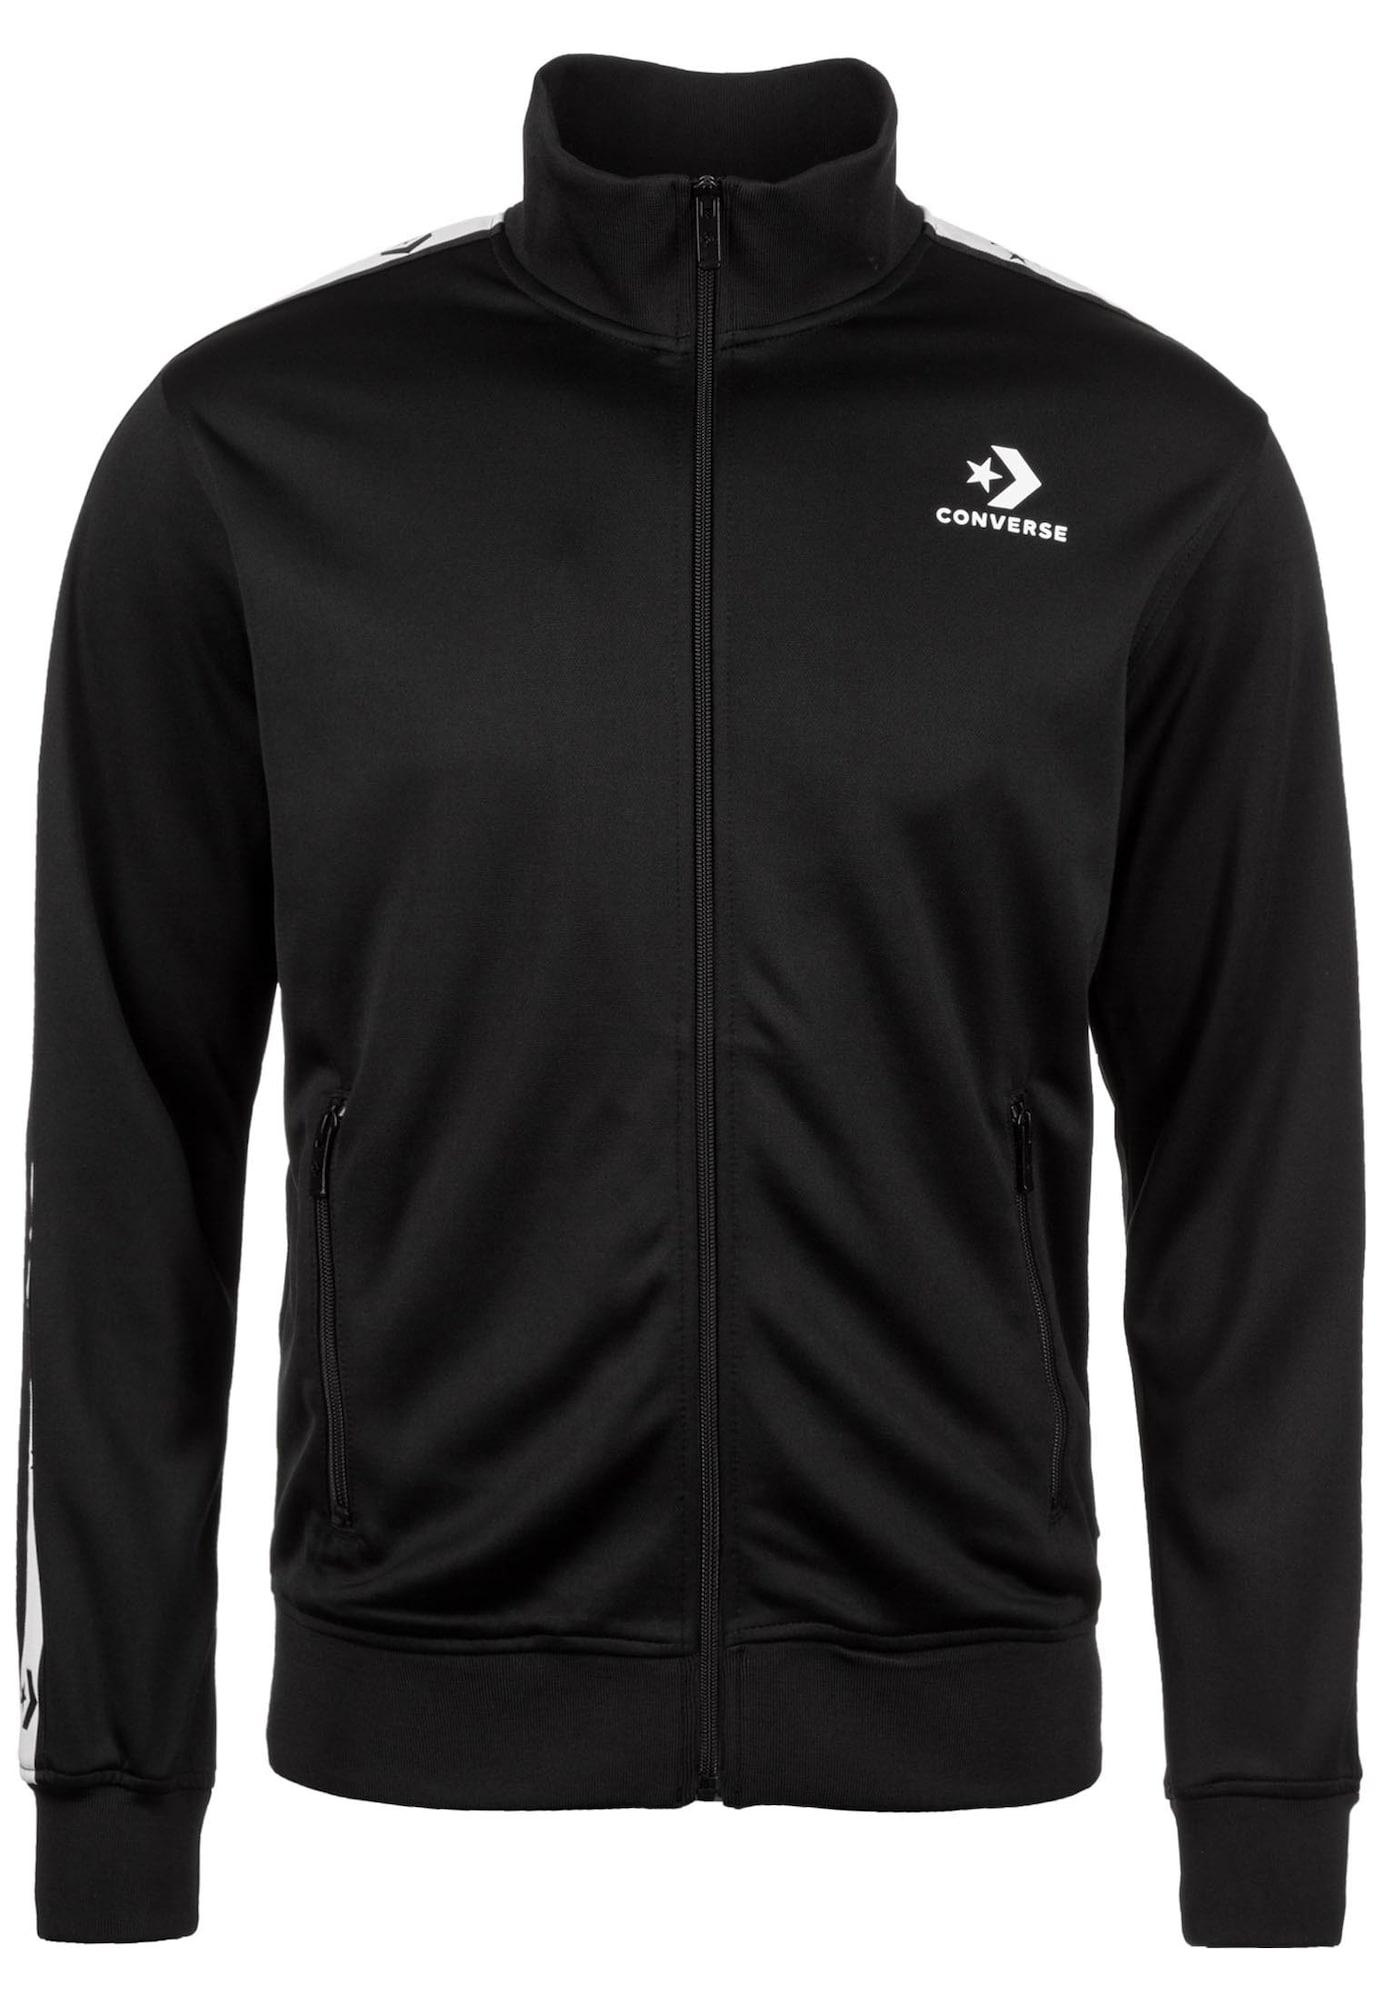 Trainingsjacke 'Chevron' | Sportbekleidung > Sportjacken > Trainingsjacken | Schwarz | Converse